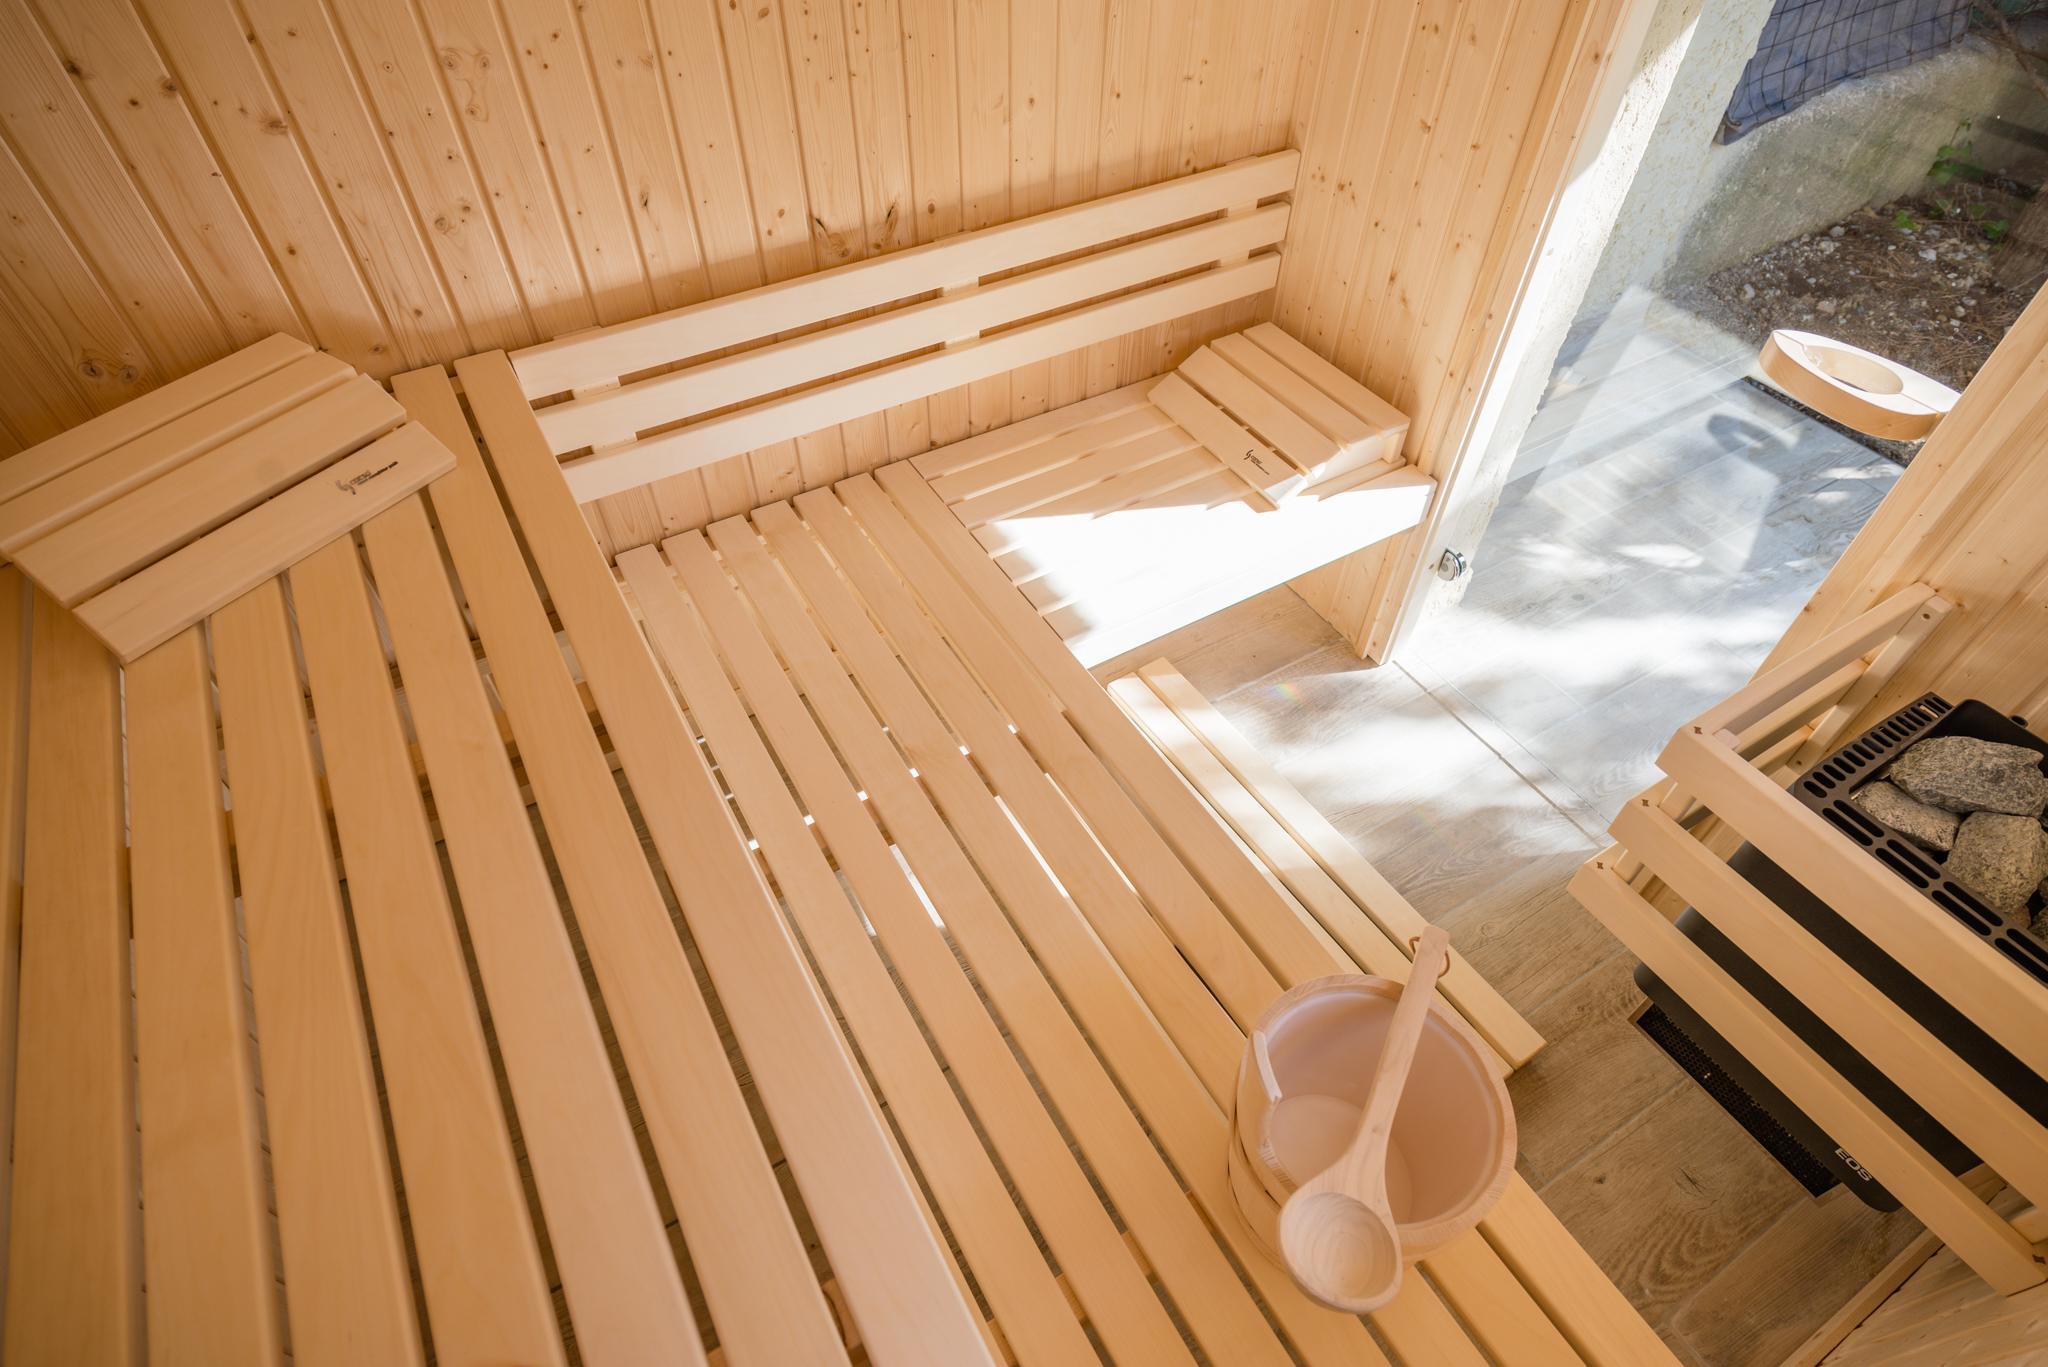 feriebolig-frankrig-sauna-pool-DSC_4648.jpg